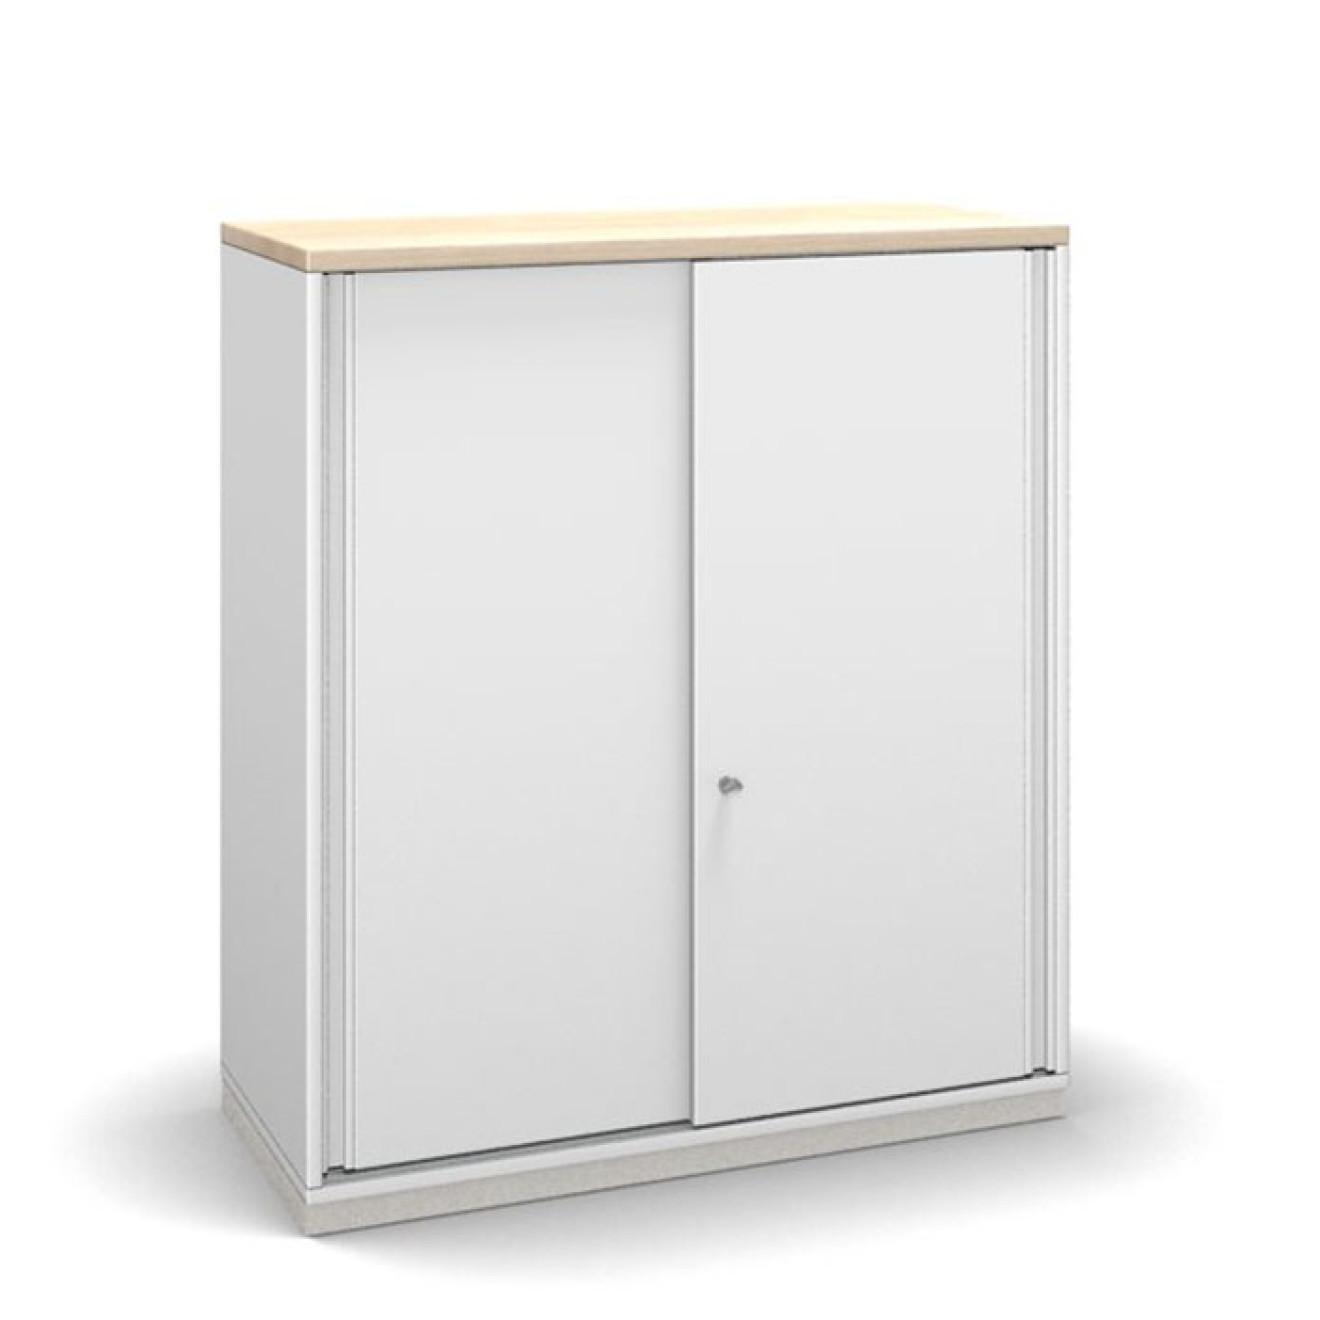 palmberg prisma 2 schiebet rschrank 100 cm. Black Bedroom Furniture Sets. Home Design Ideas